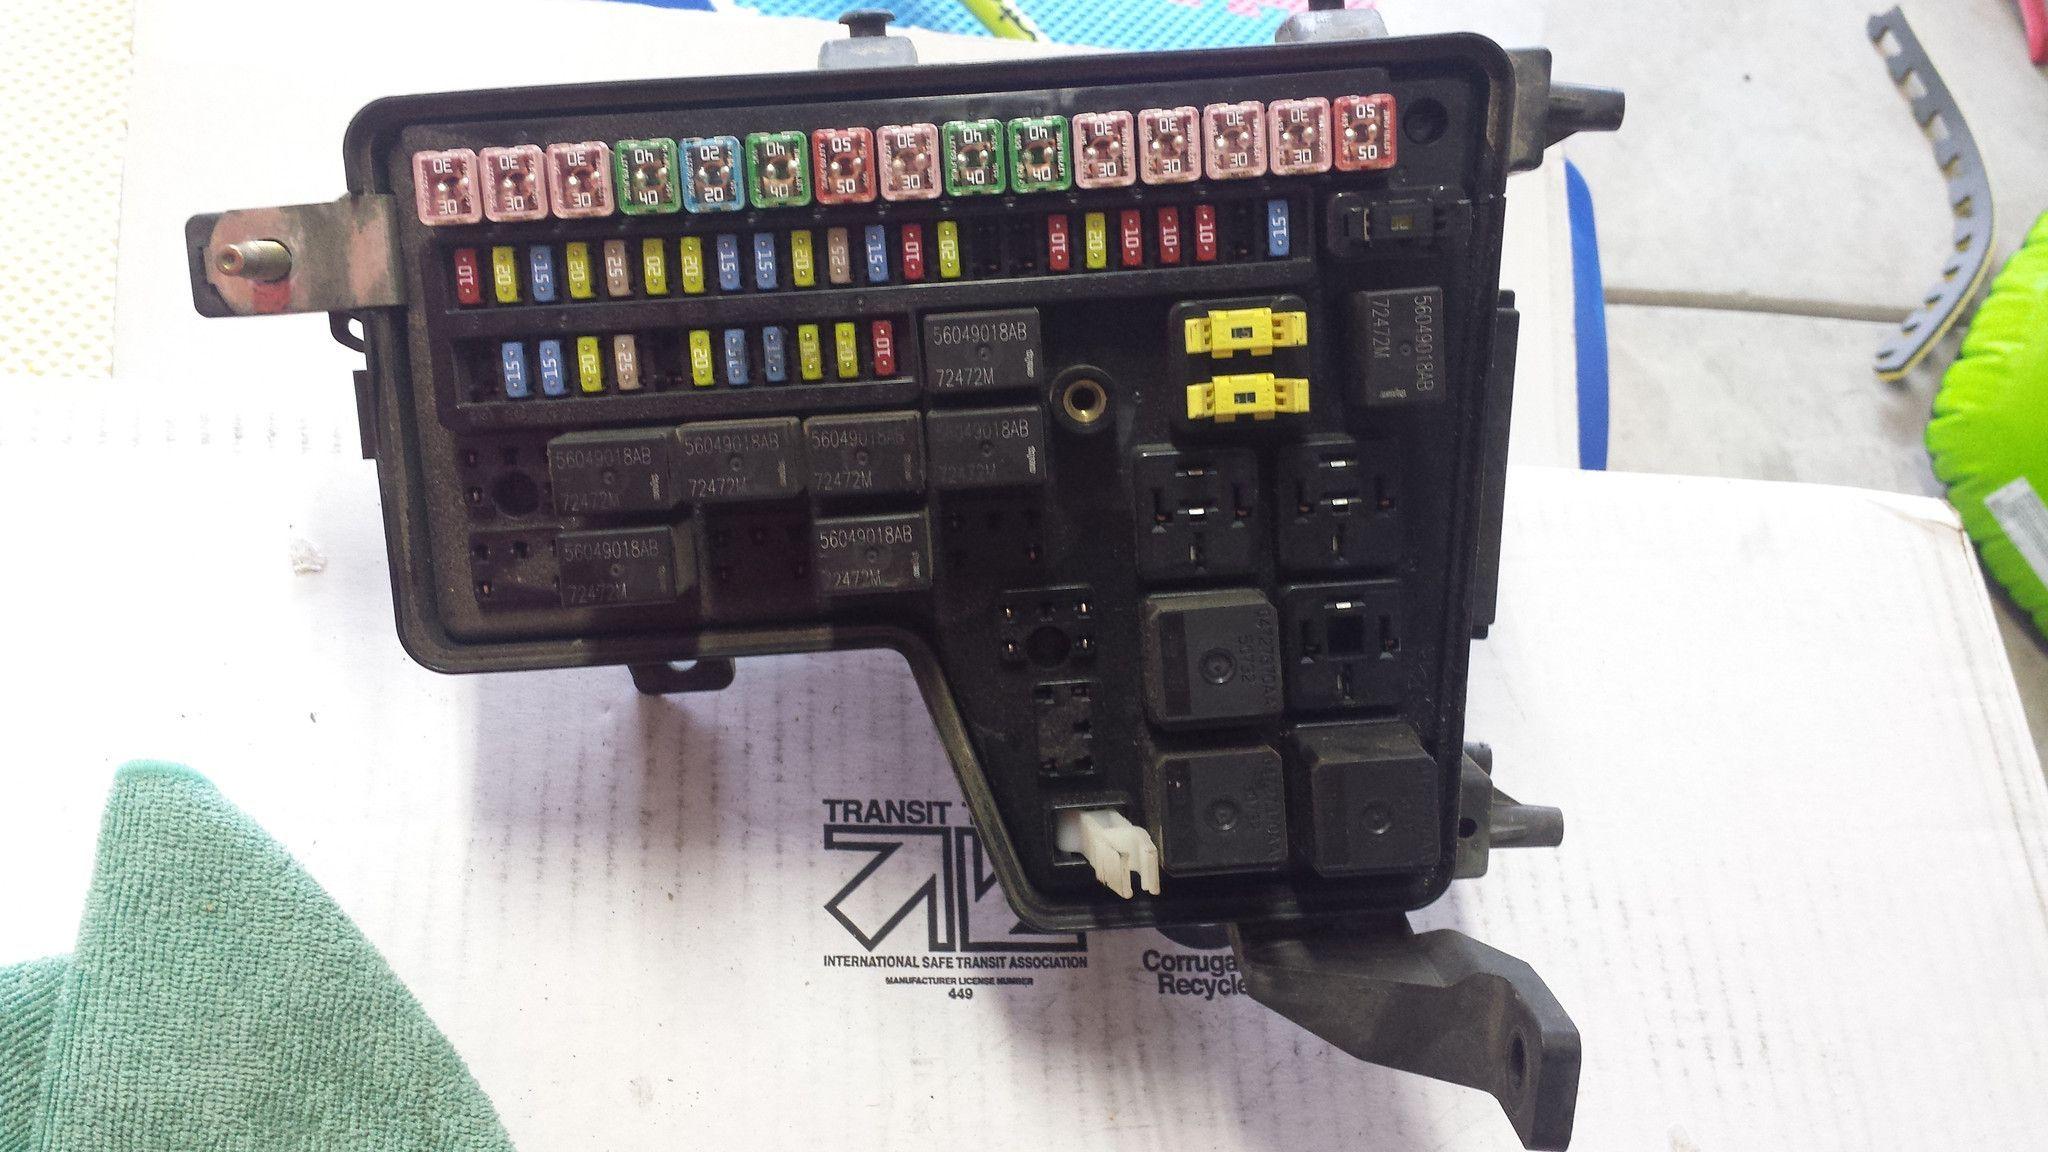 04 05 dodge ram 1500 5 7l fuse box integrated power module p56051039ad a [ 2048 x 1152 Pixel ]